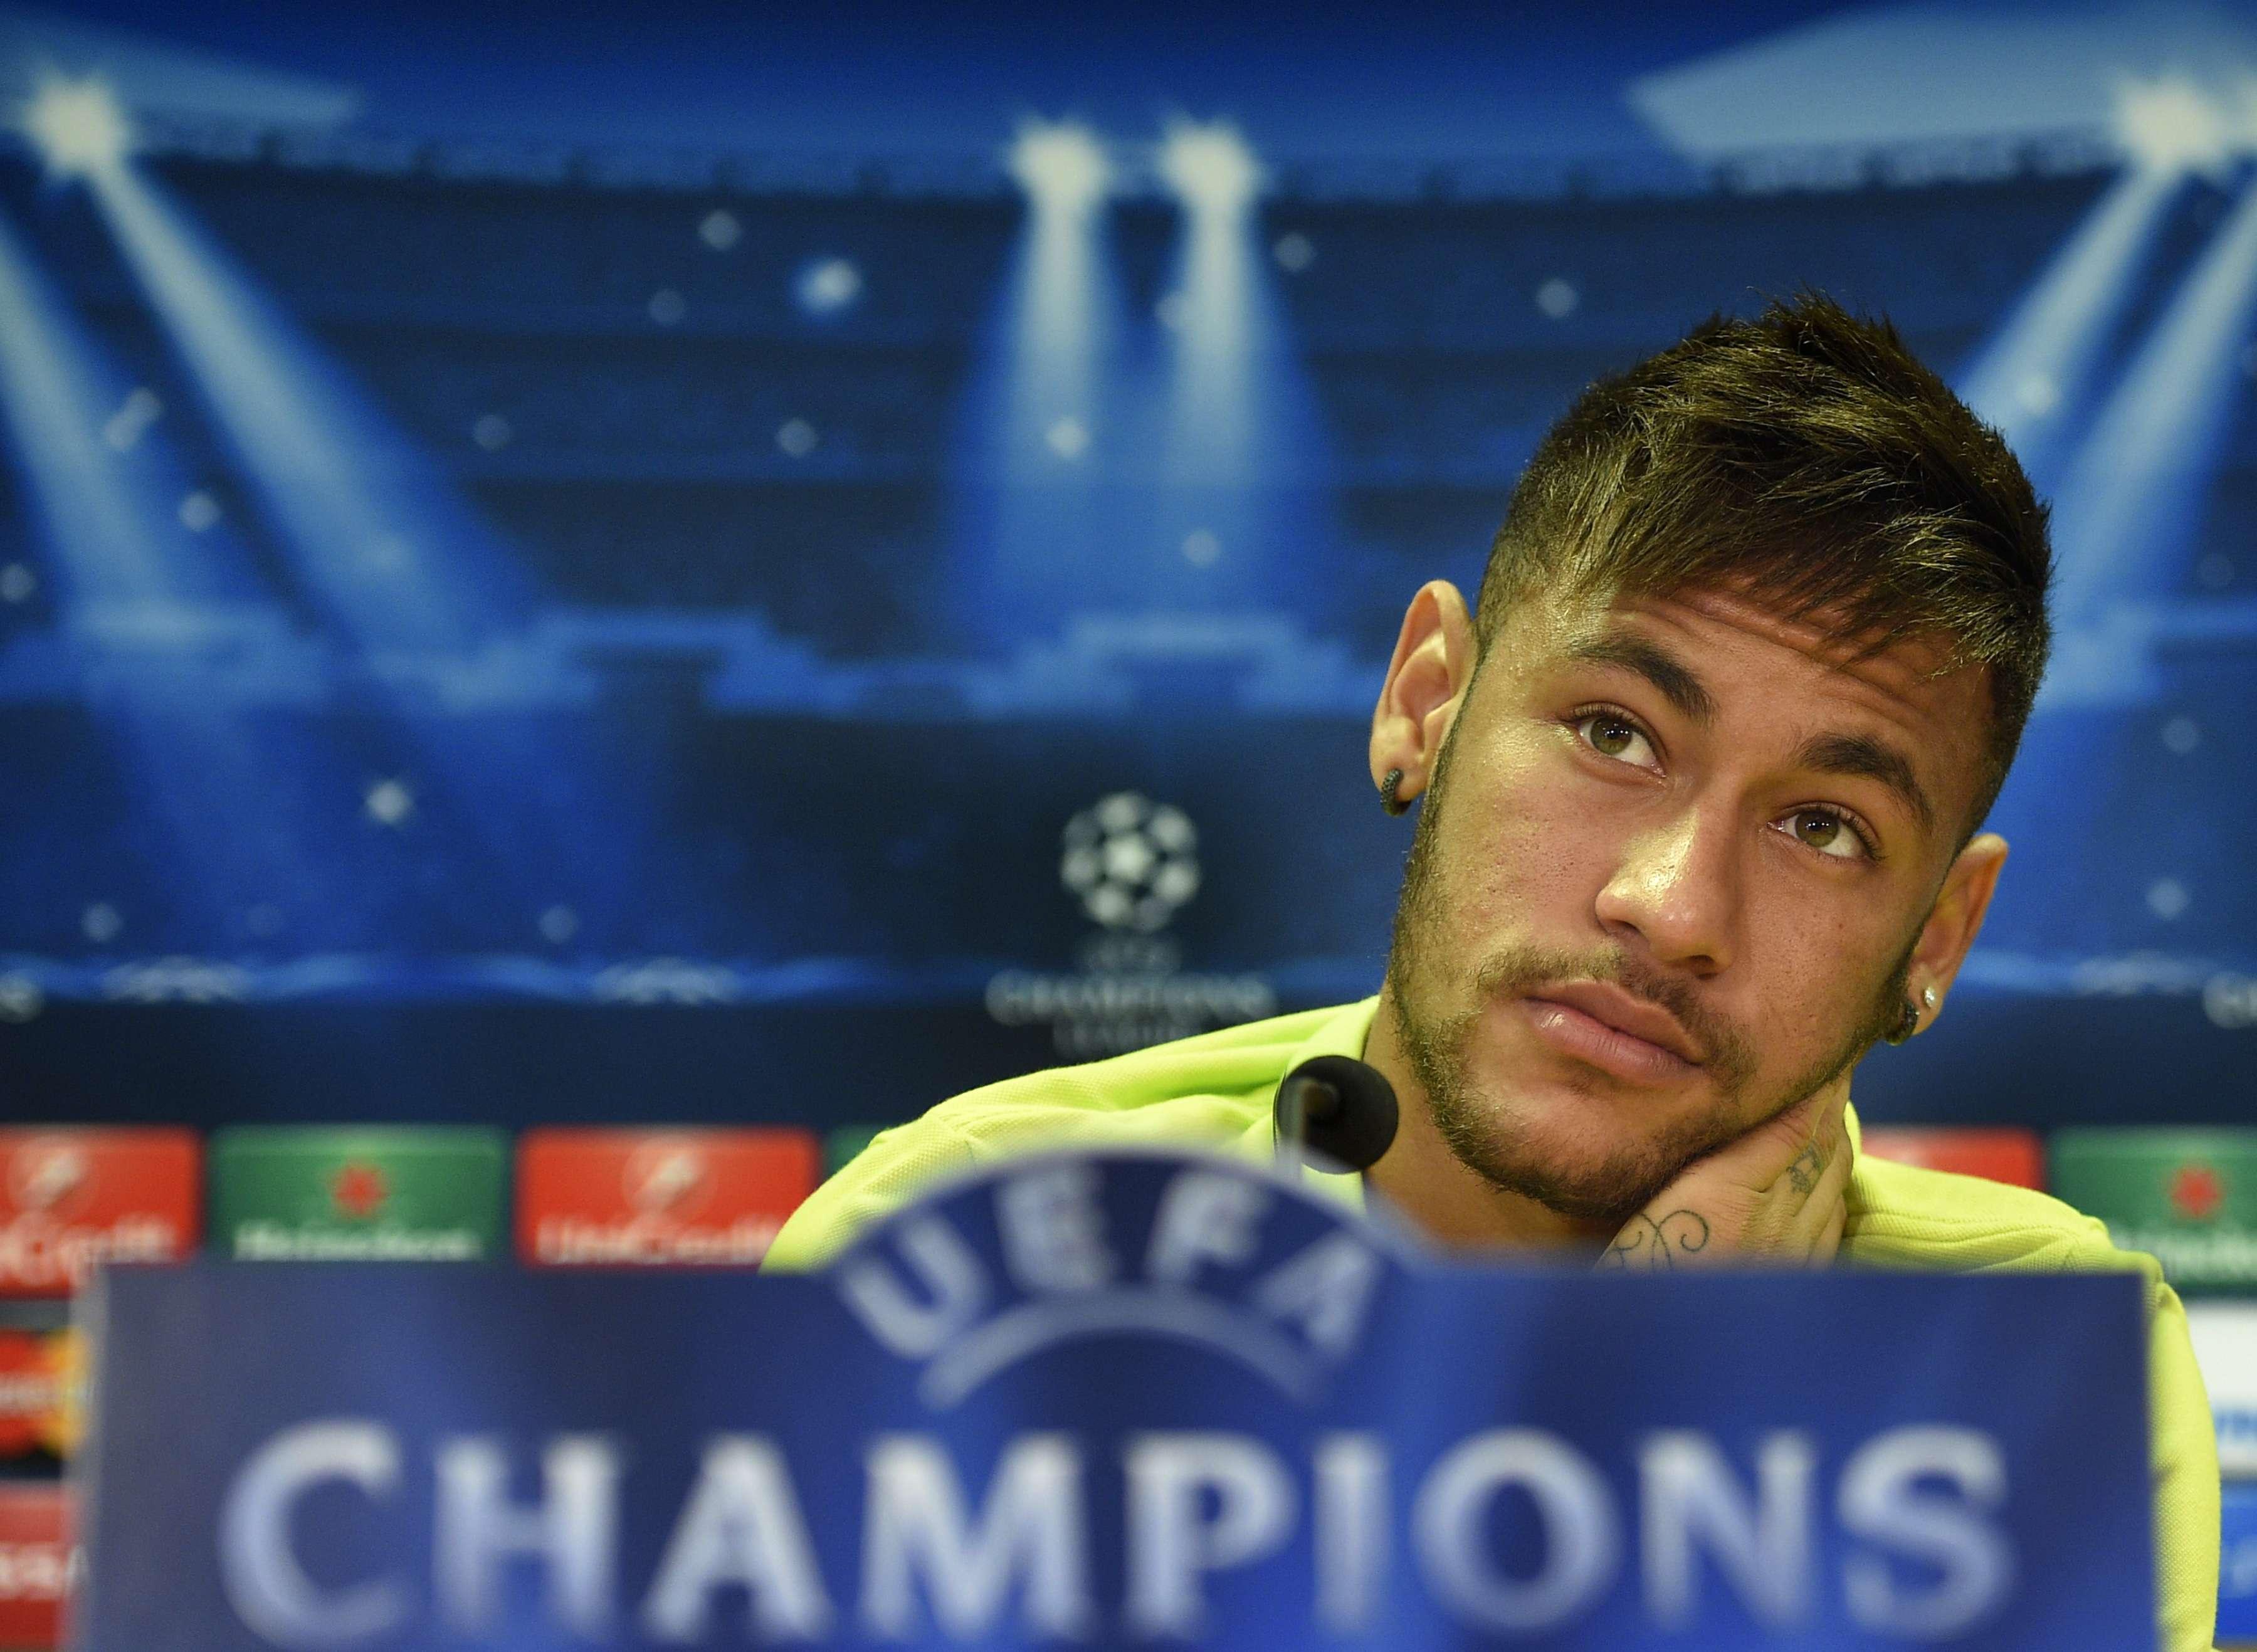 Neymar durante entrevista coletiva Foto: Lluis Gene/AFP